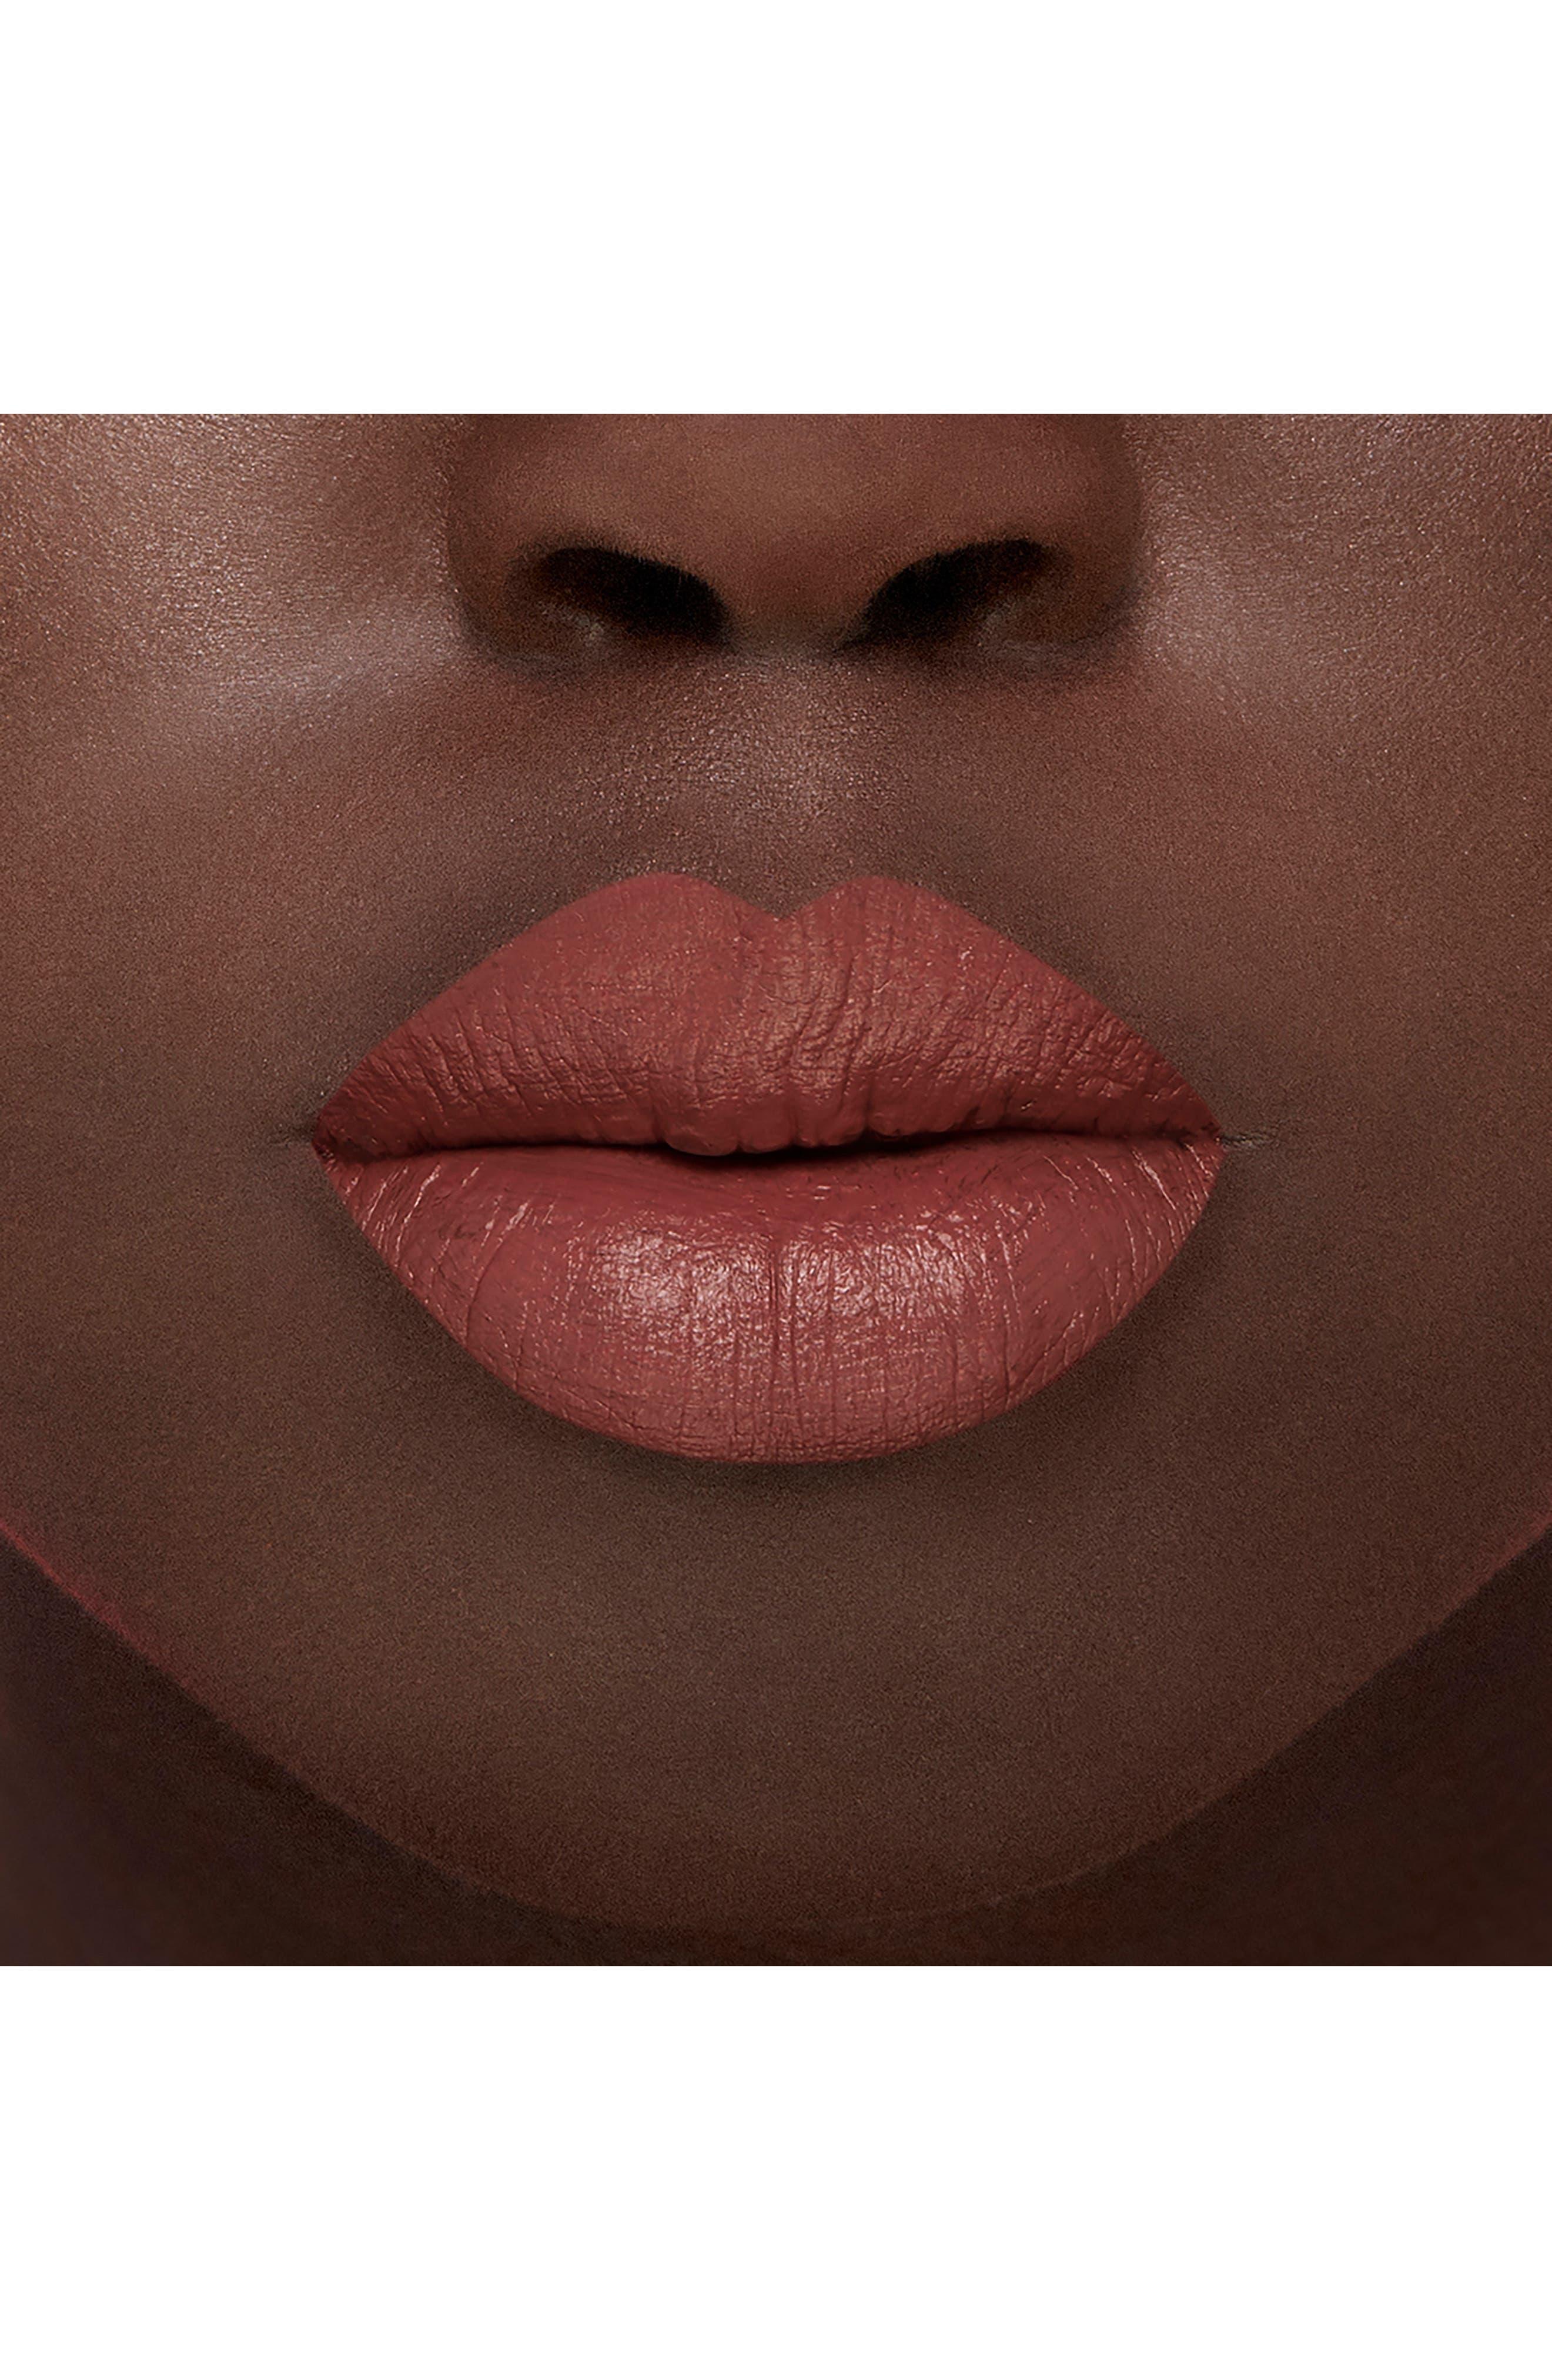 KARL LAGERFELD + MODELCO Kiss Me Karl Lip Lights Lipstick,                             Alternate thumbnail 5, color,                             200